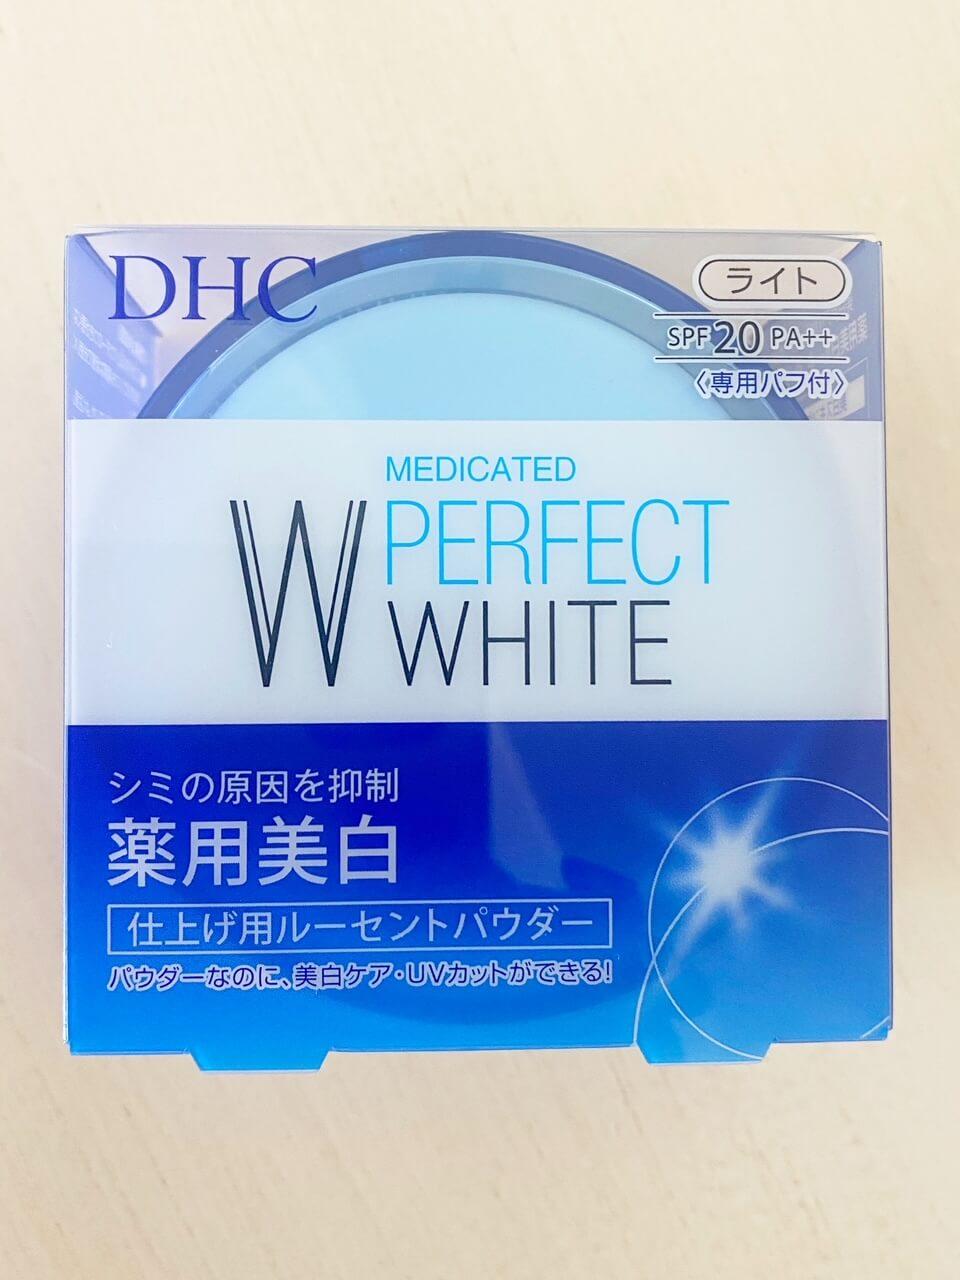 DHC 薬用PWルーセントパウダー ブログ レビュー くちこみ